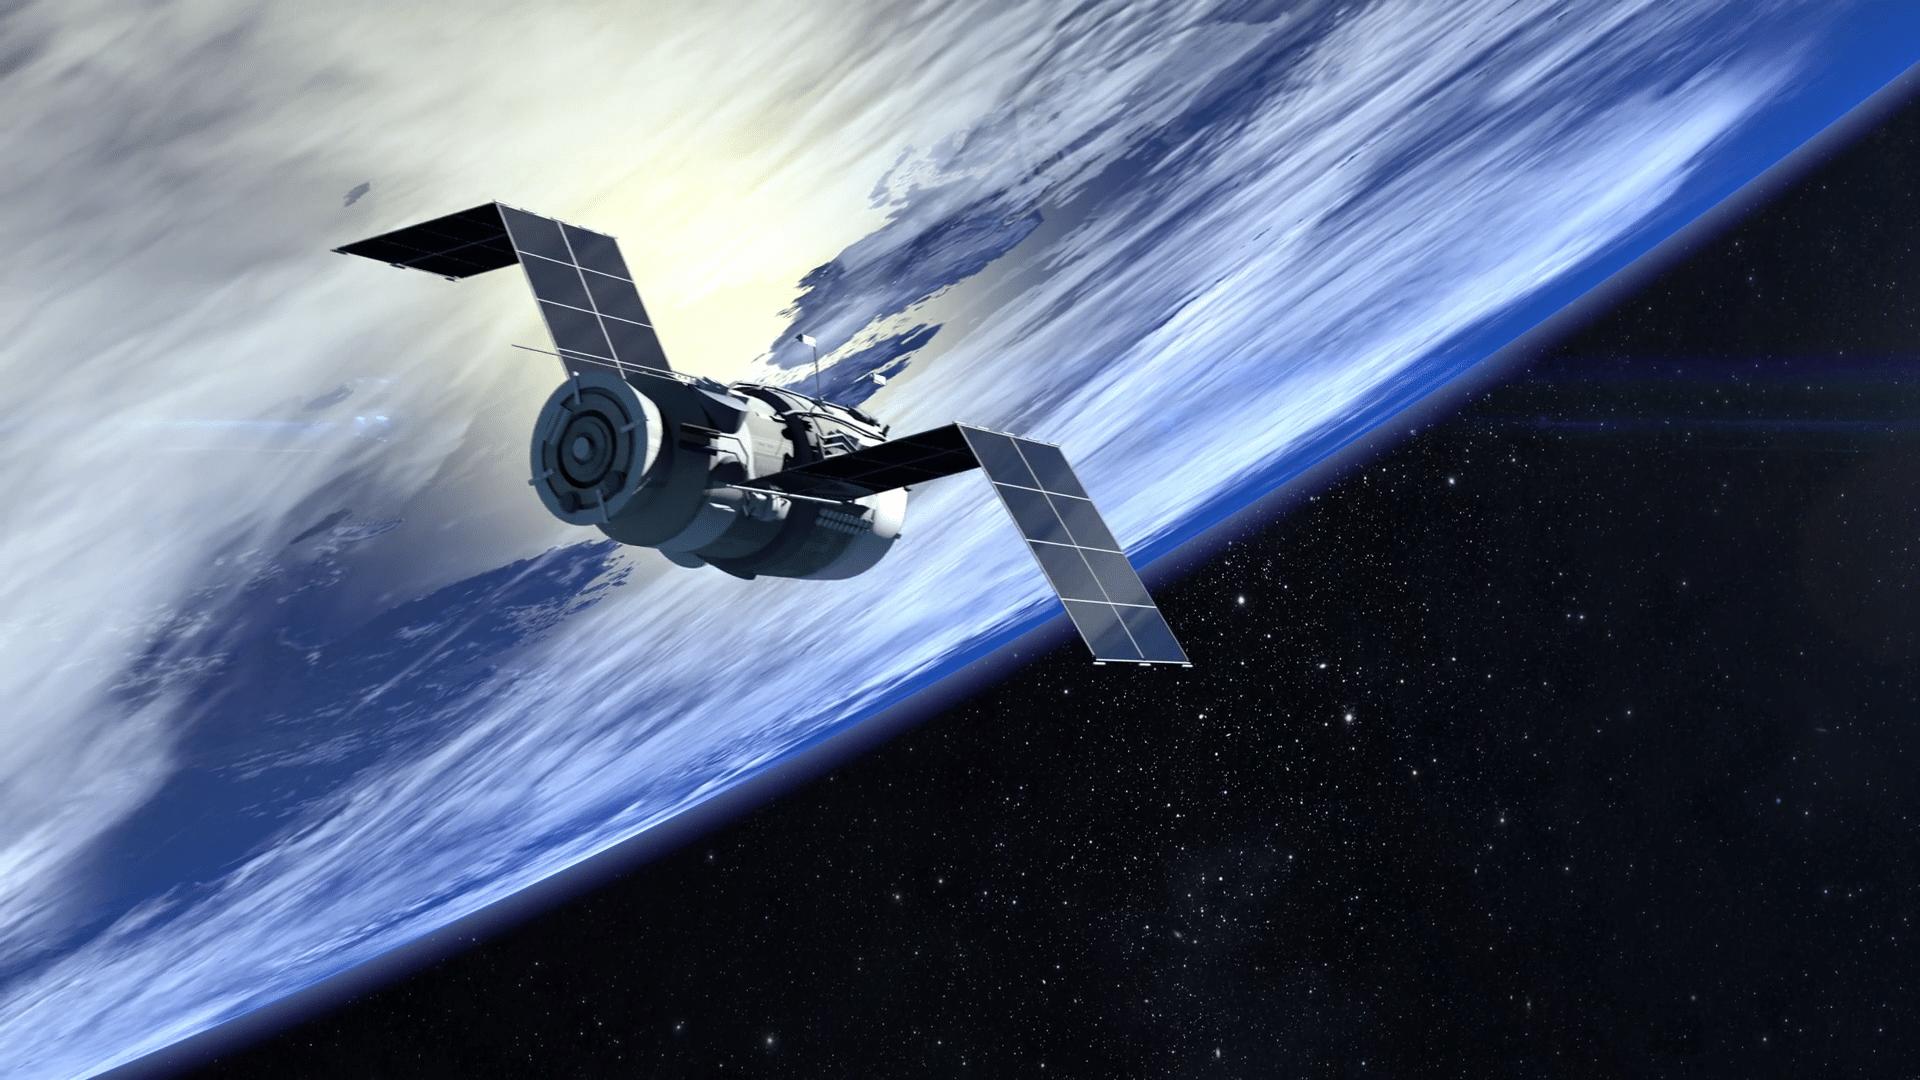 Photo of الجزائر تستخدم نظام الملاحة بالأقمار الصناعية الروسي GLONASS لتوجيه الذخائر عالية الدقة